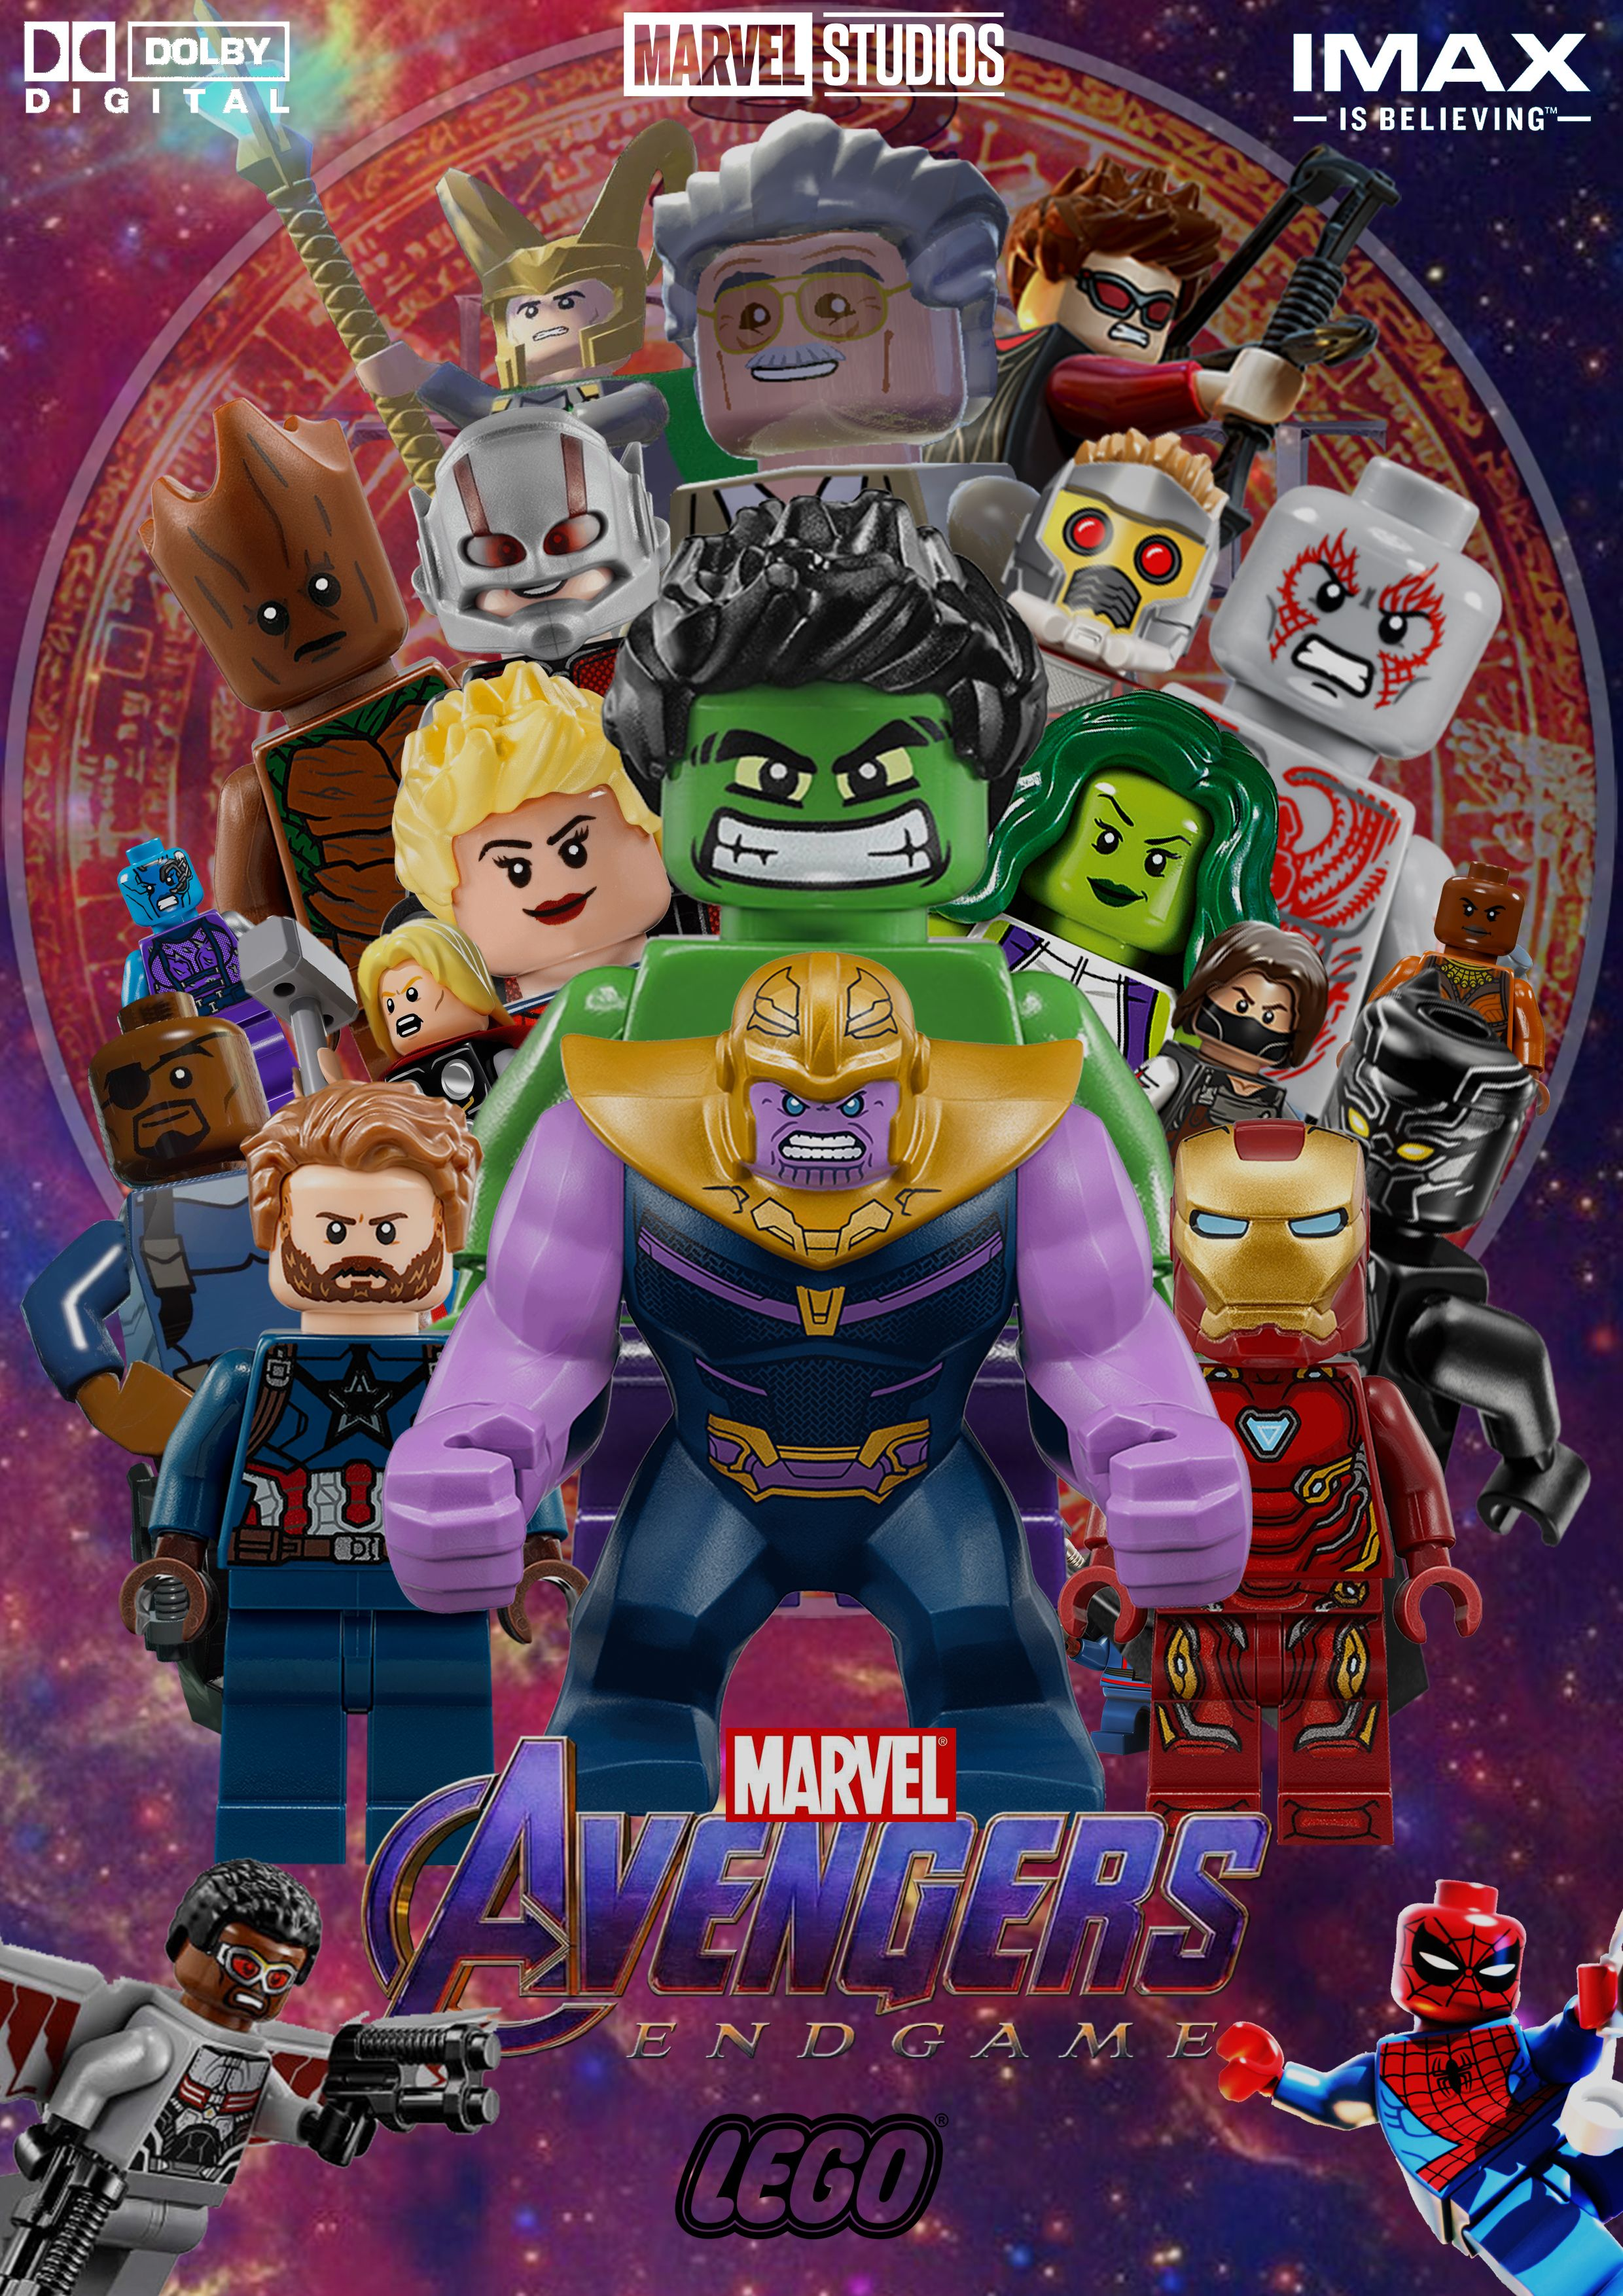 Avengers endgame movie poster lego version designed by